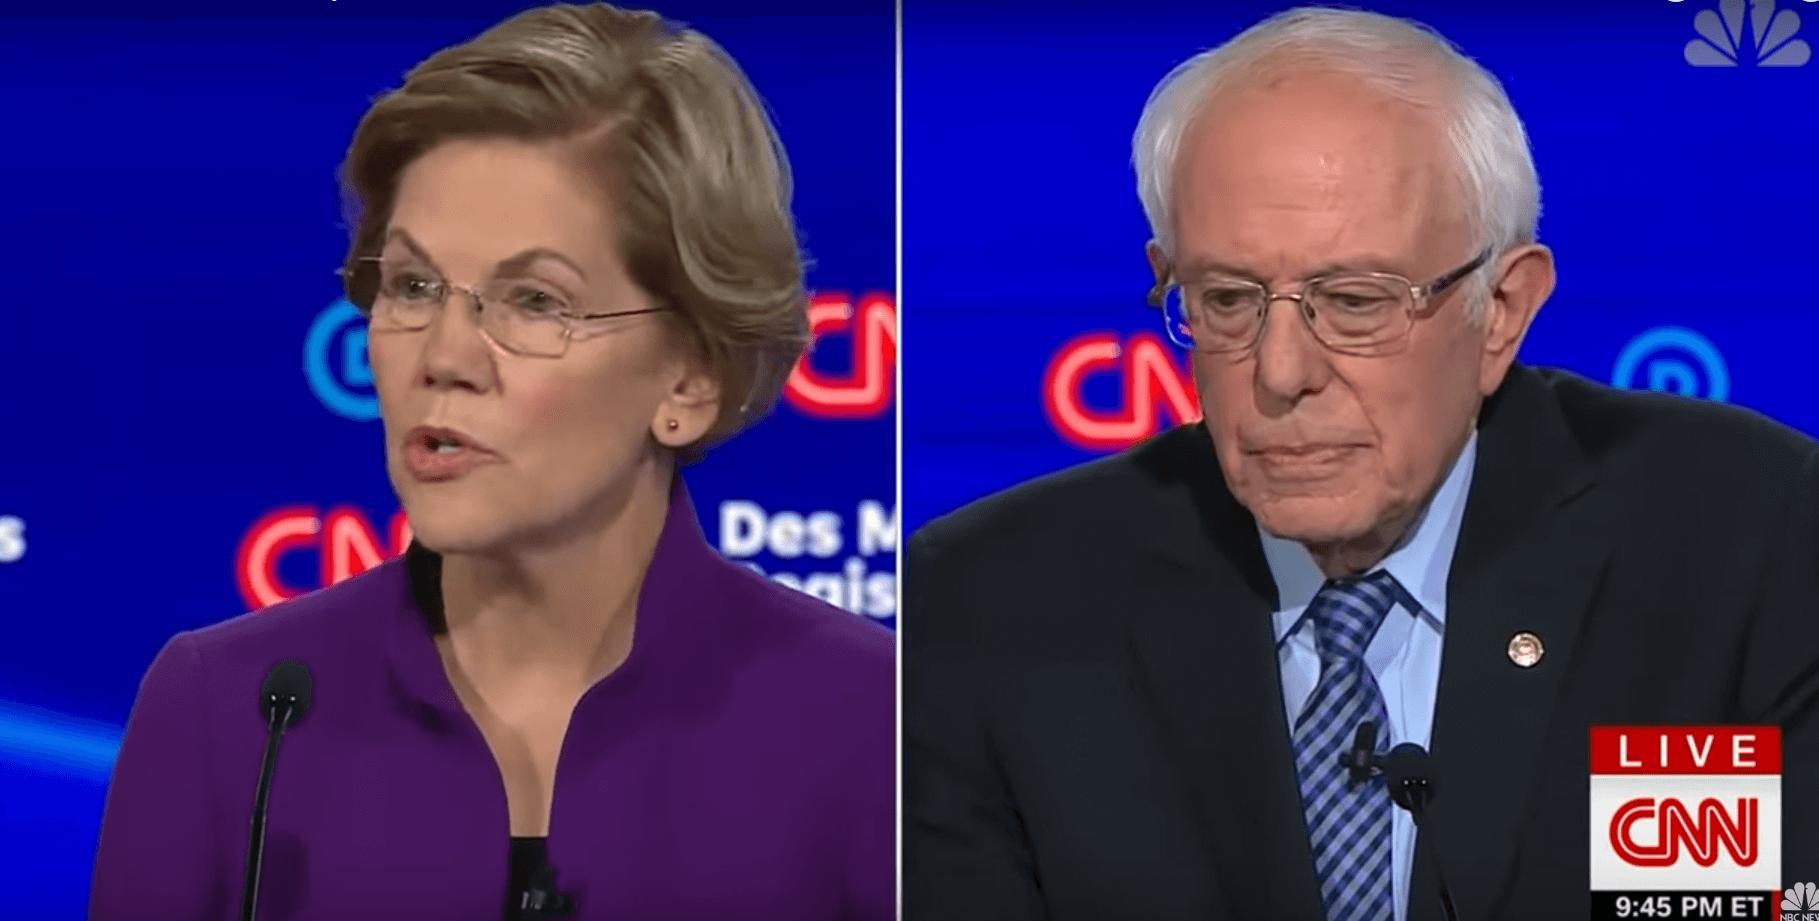 Elizabeth Warren and Bernie Sanders in Jan. 14, 2019. screenshot.